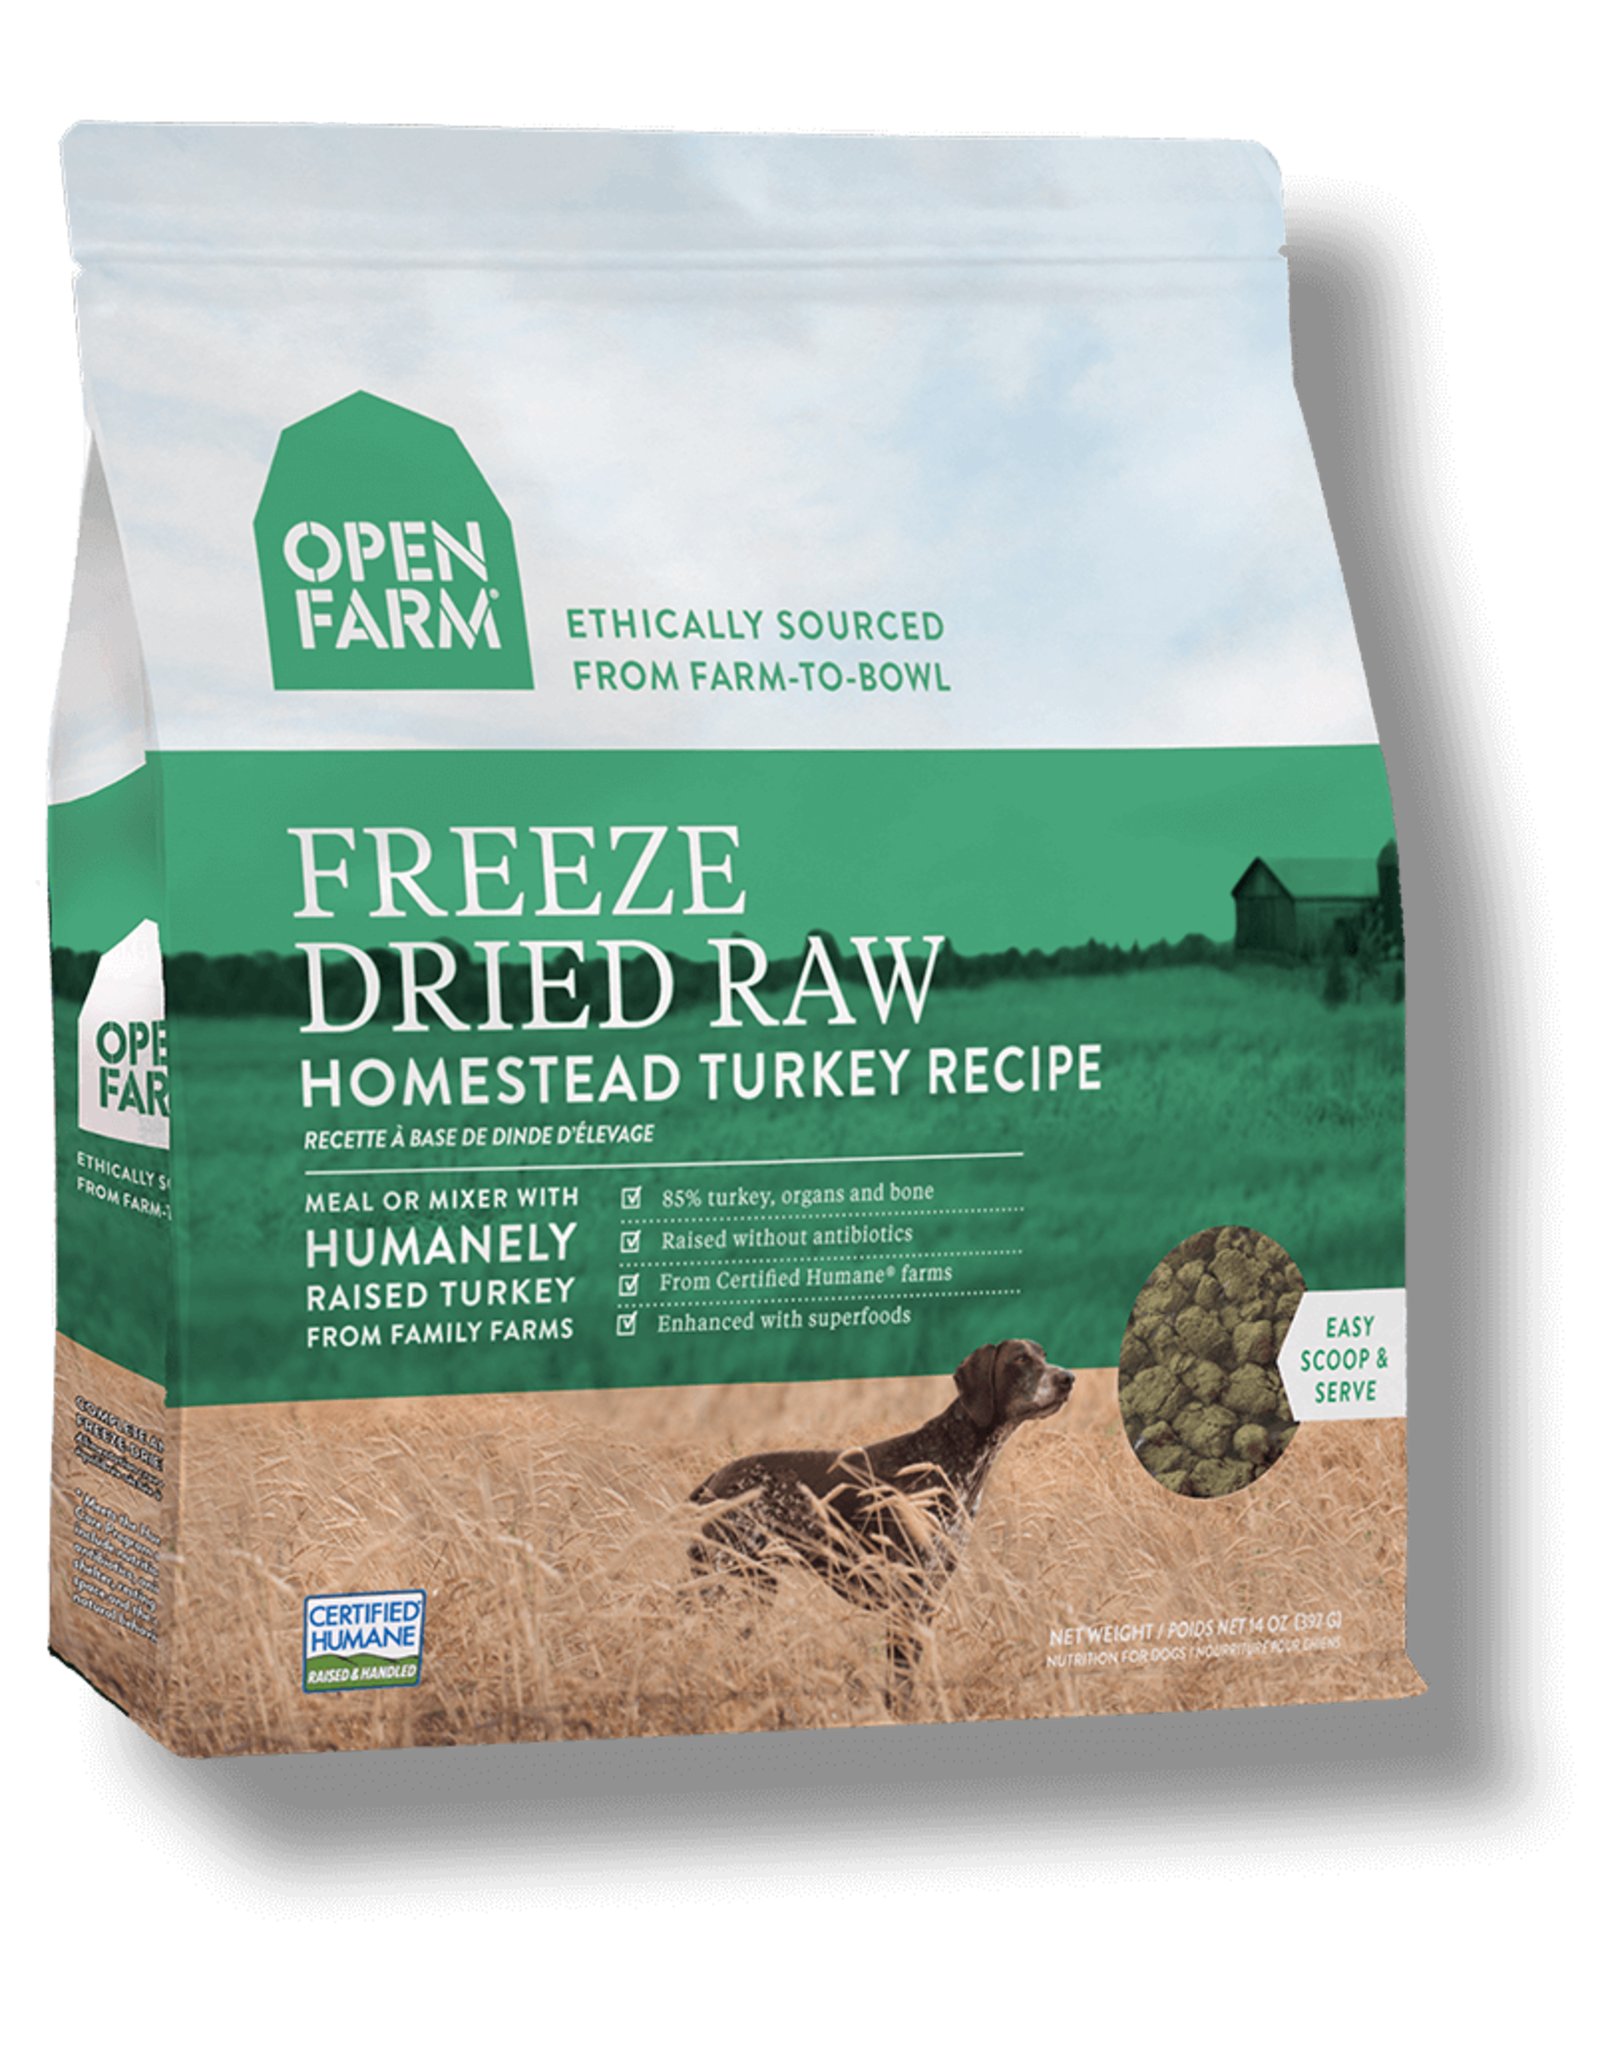 Open Farm OPEN FARM DOG FREEZE DRIED RAW HOMESTEAD TURKEY RECIPE